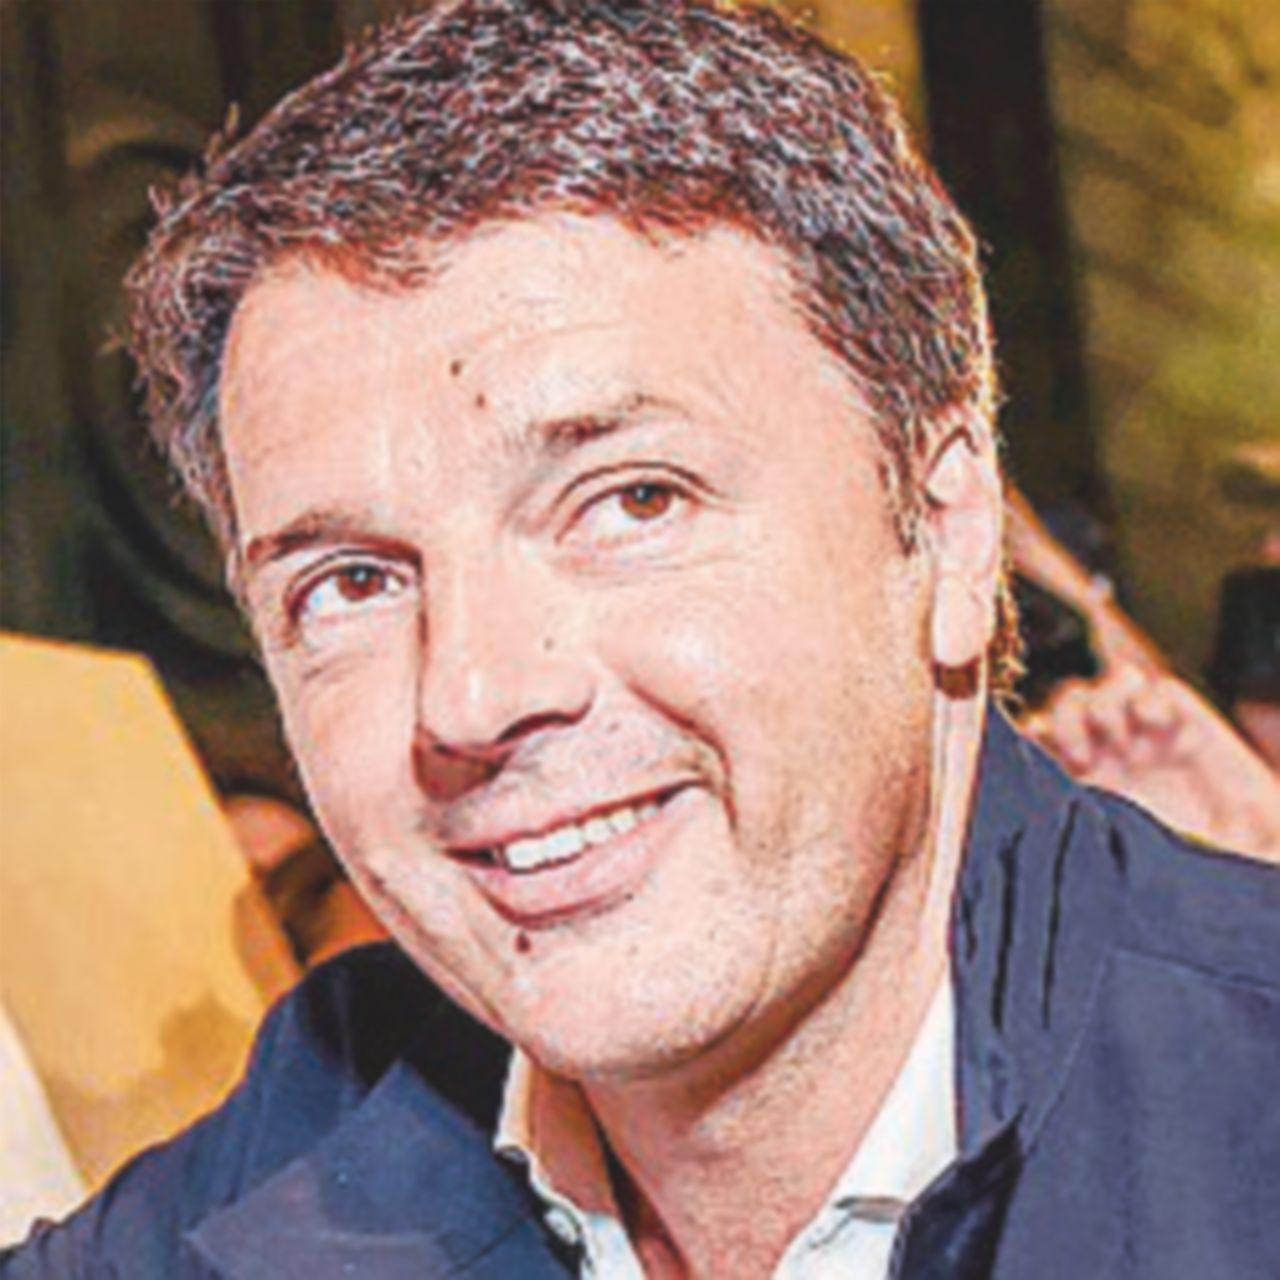 É un punto per l'accusa, perché Renzi ora esulta?